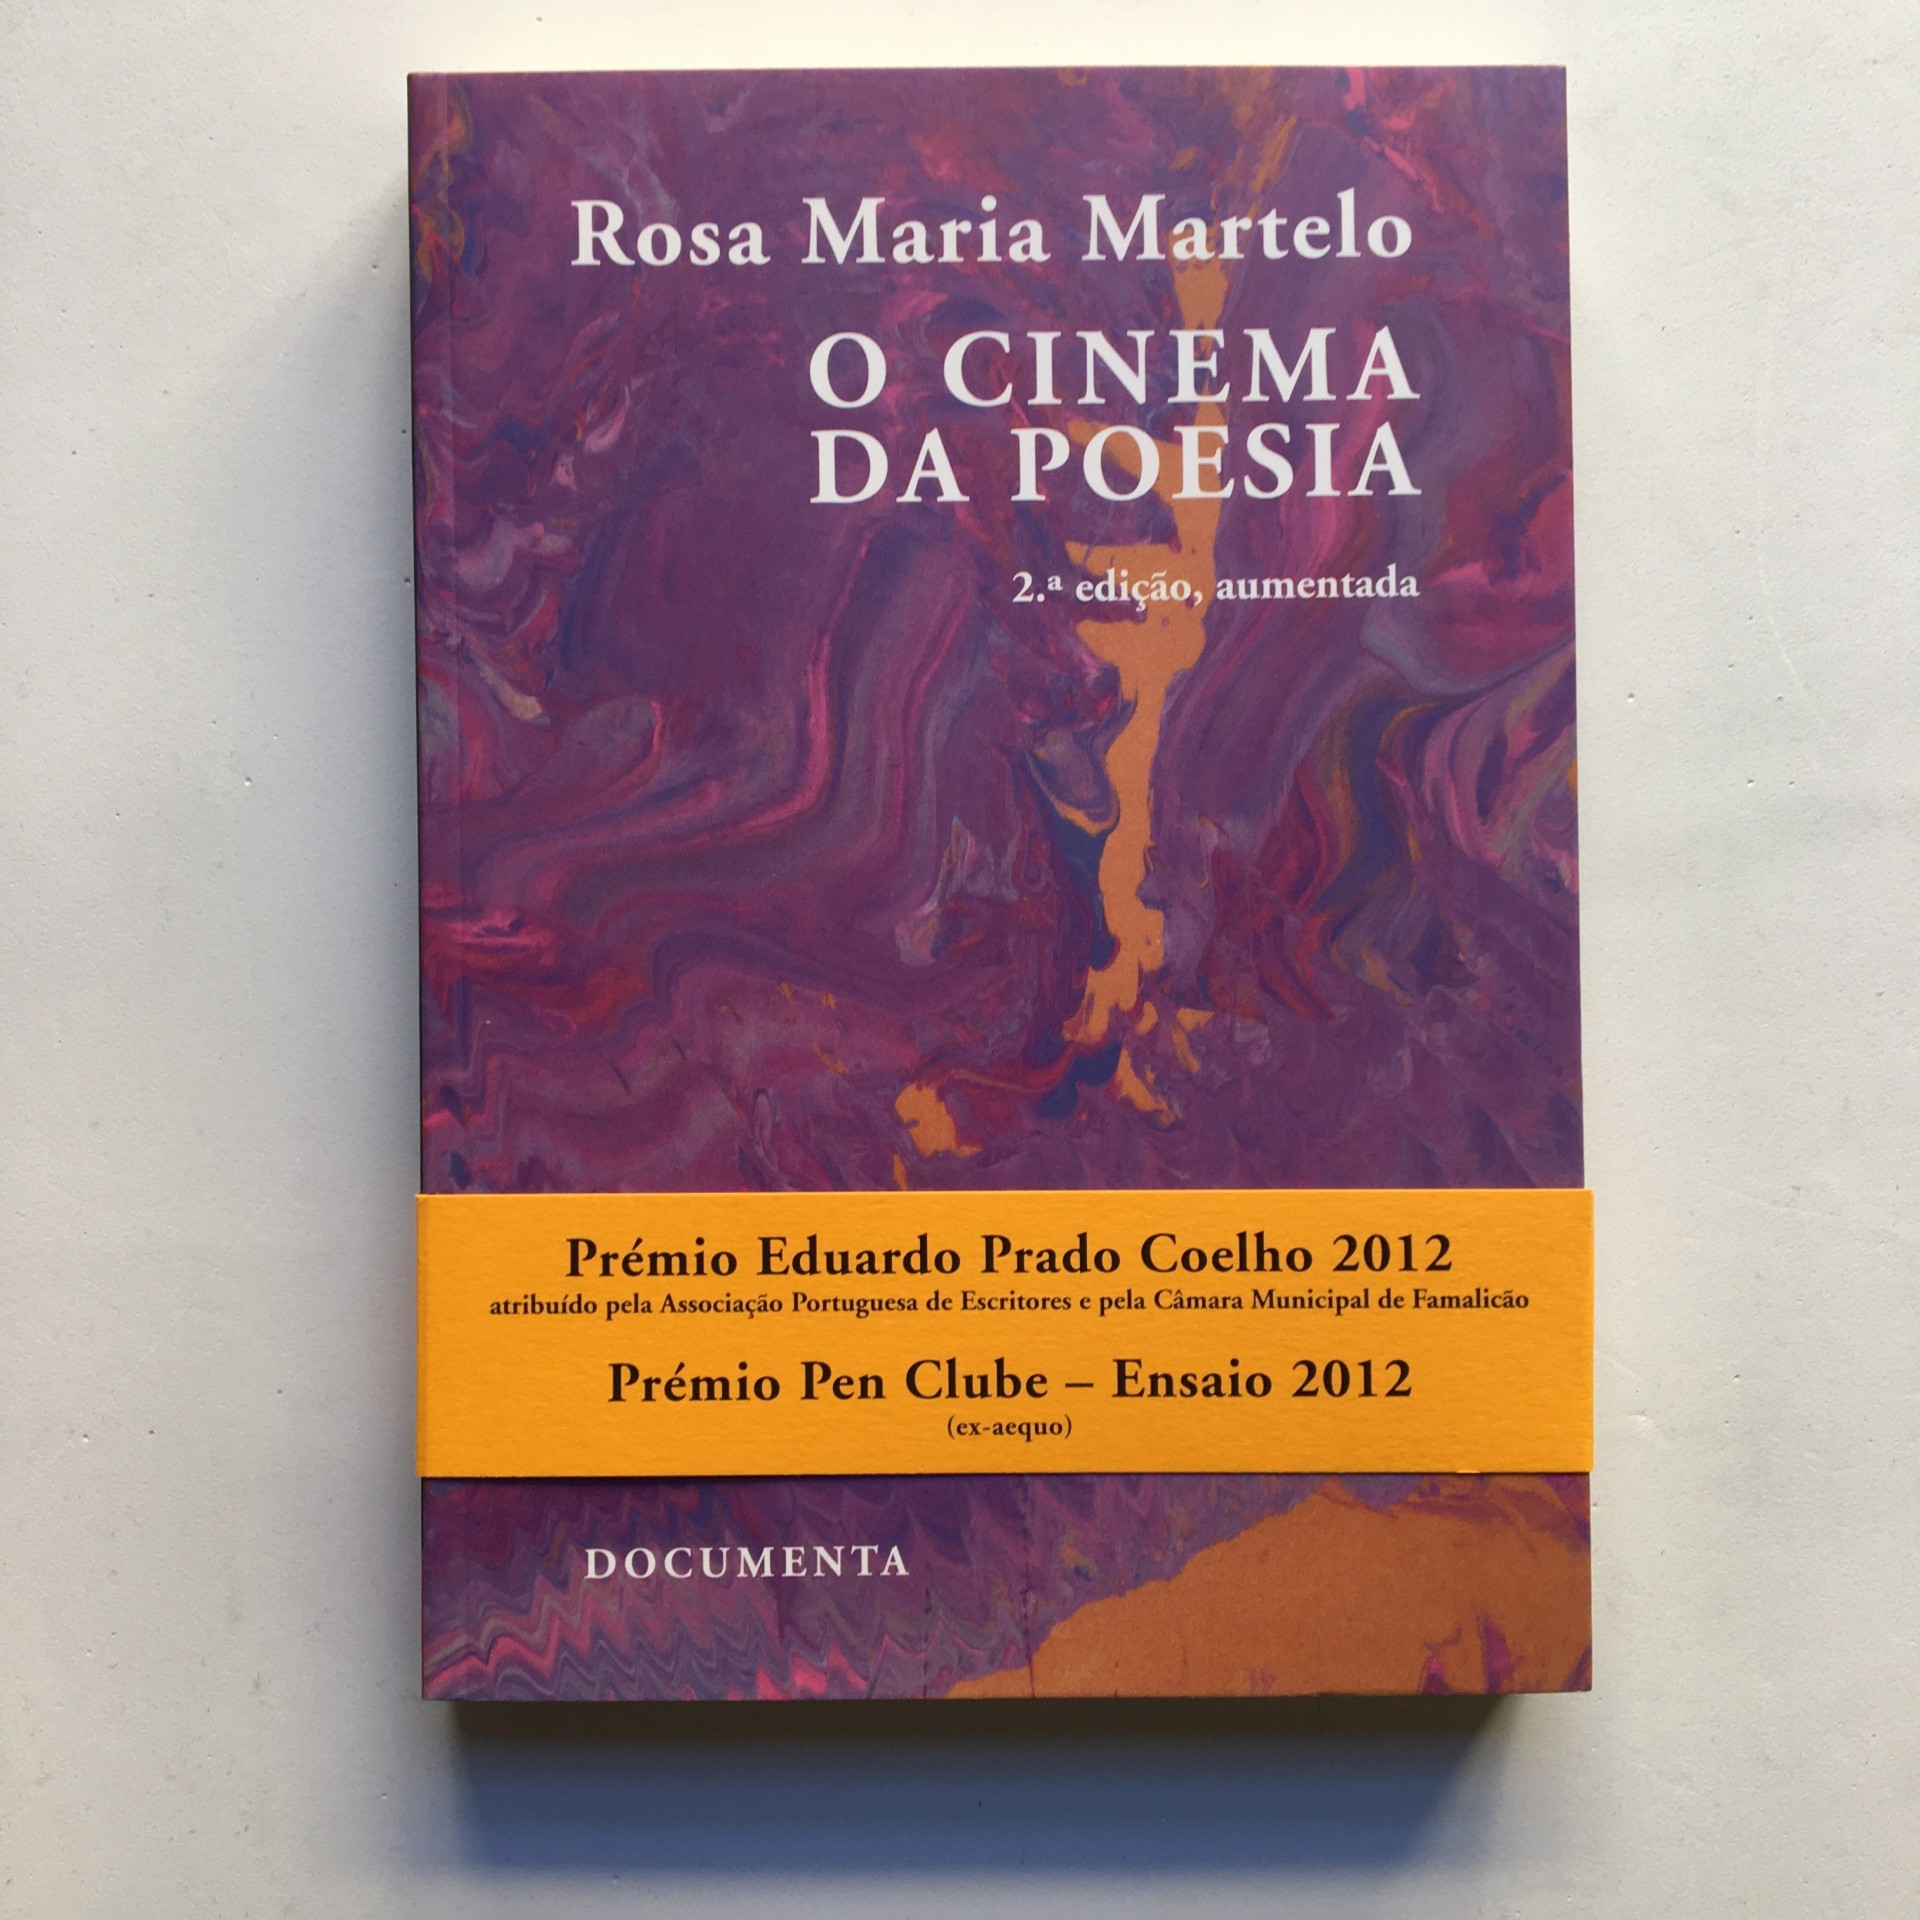 O Cinema da Poesia